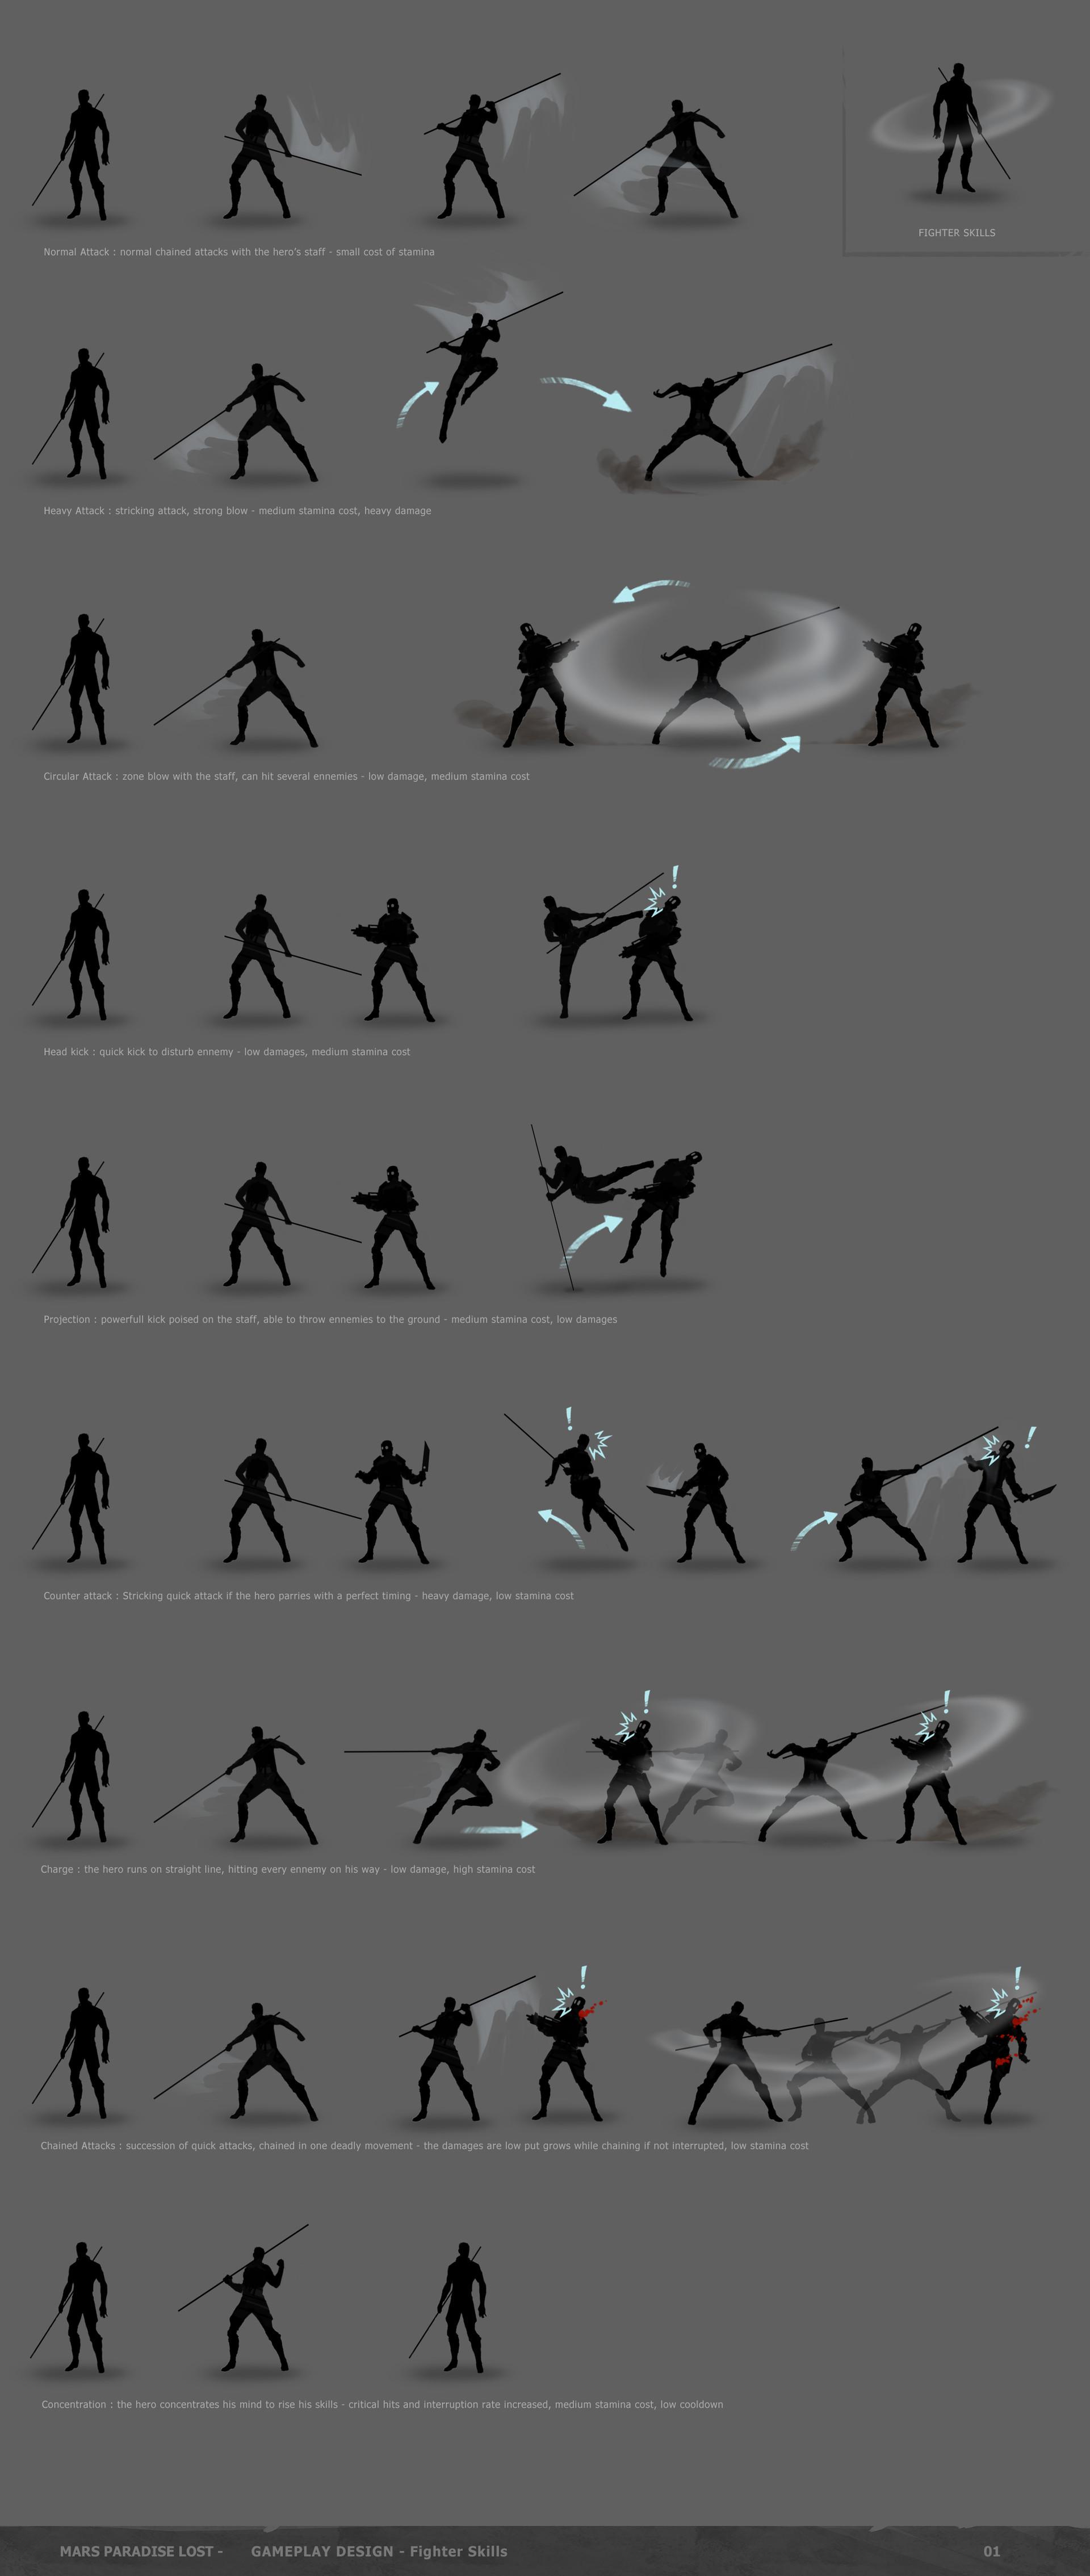 Alexandre chaudret mars2 gameplaydesign skills staff01